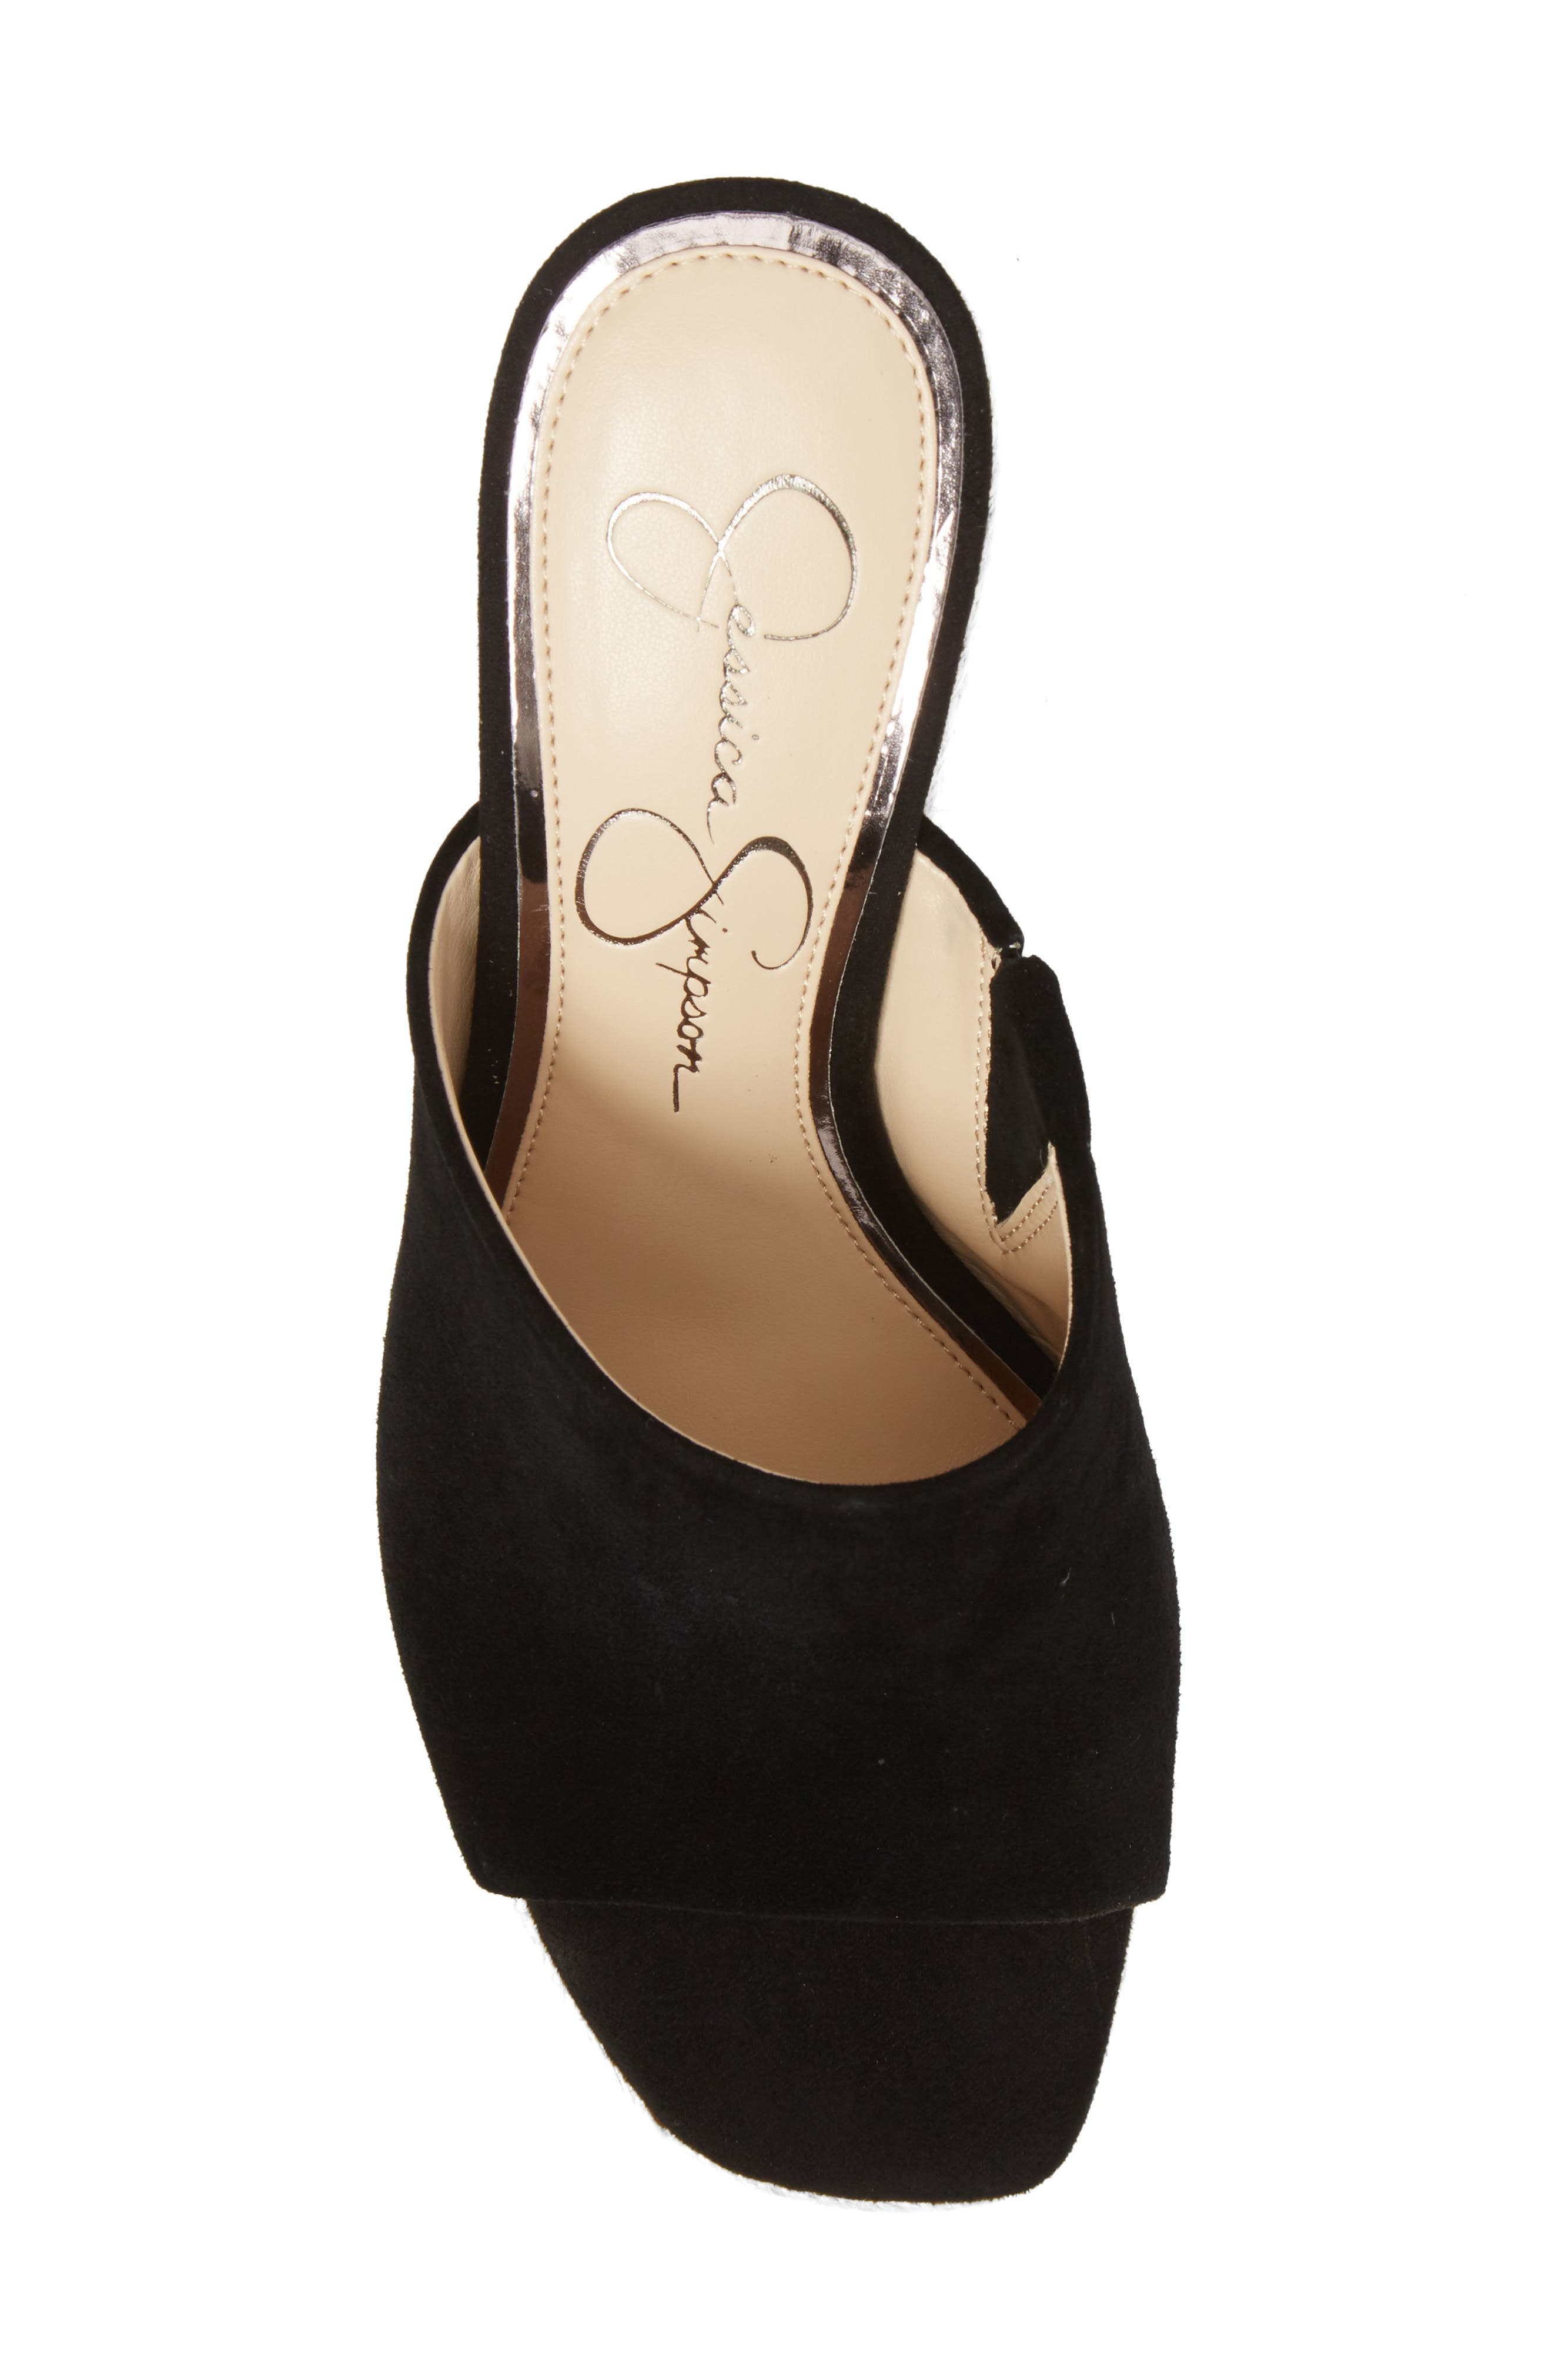 Sirella Platform Wedge Slide Sandal,                             Alternate thumbnail 5, color,                             001